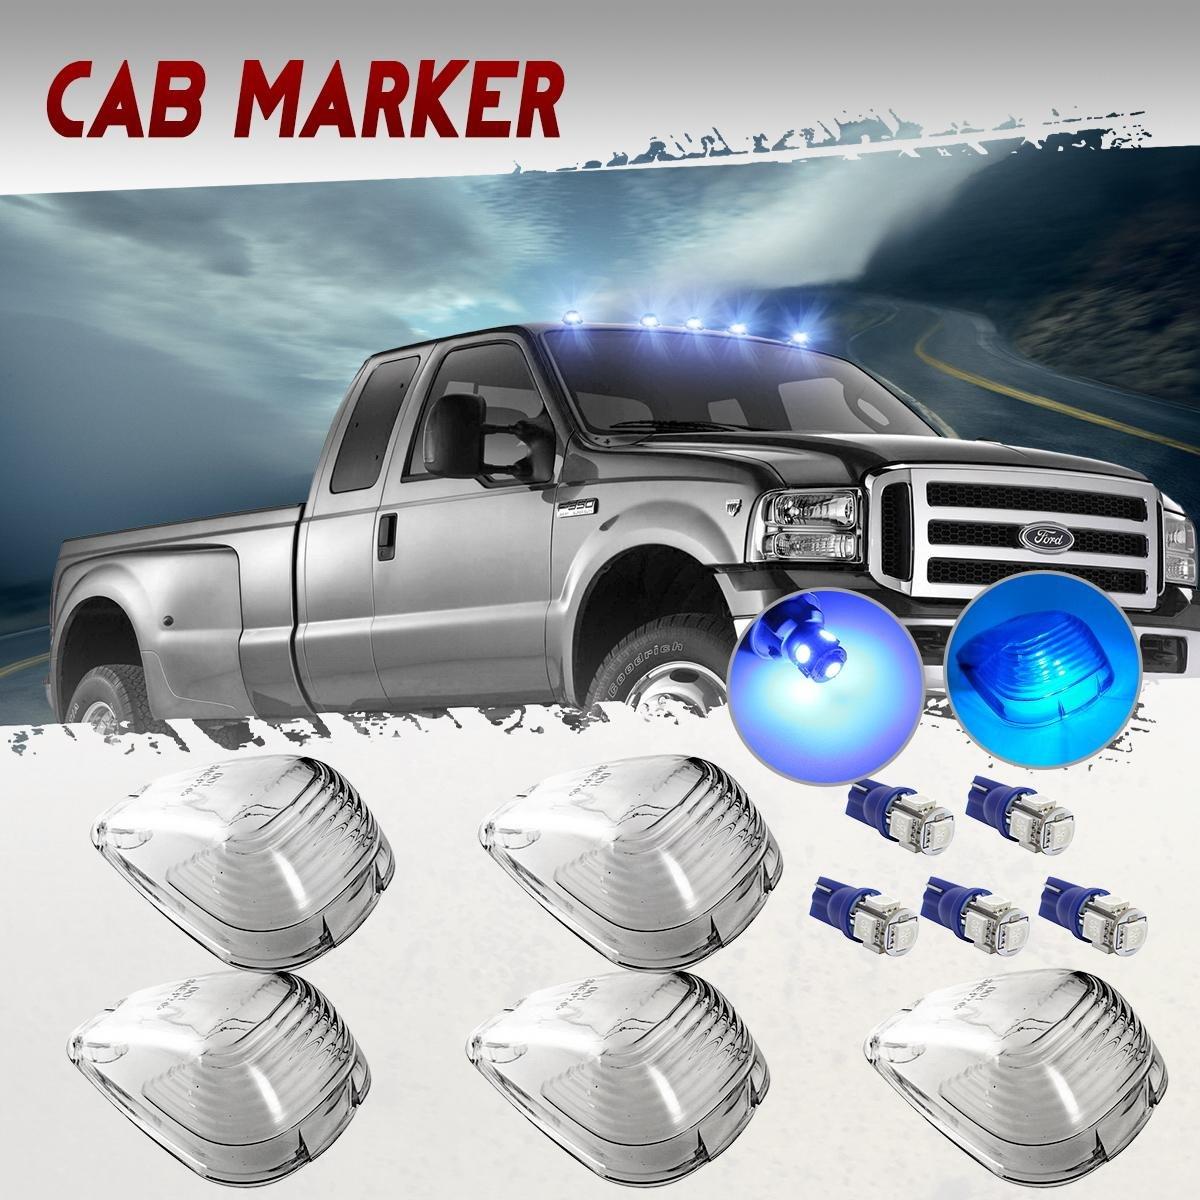 Partsam 5x Clear Cab Marker Clearance Light + 5x Amber 5050-SMD 194 168 T10 LED Bulb Replacement For 1999-2016 E150 E250 E350 E350 E450 F150 F250 F350 F450 F550 Super Duty